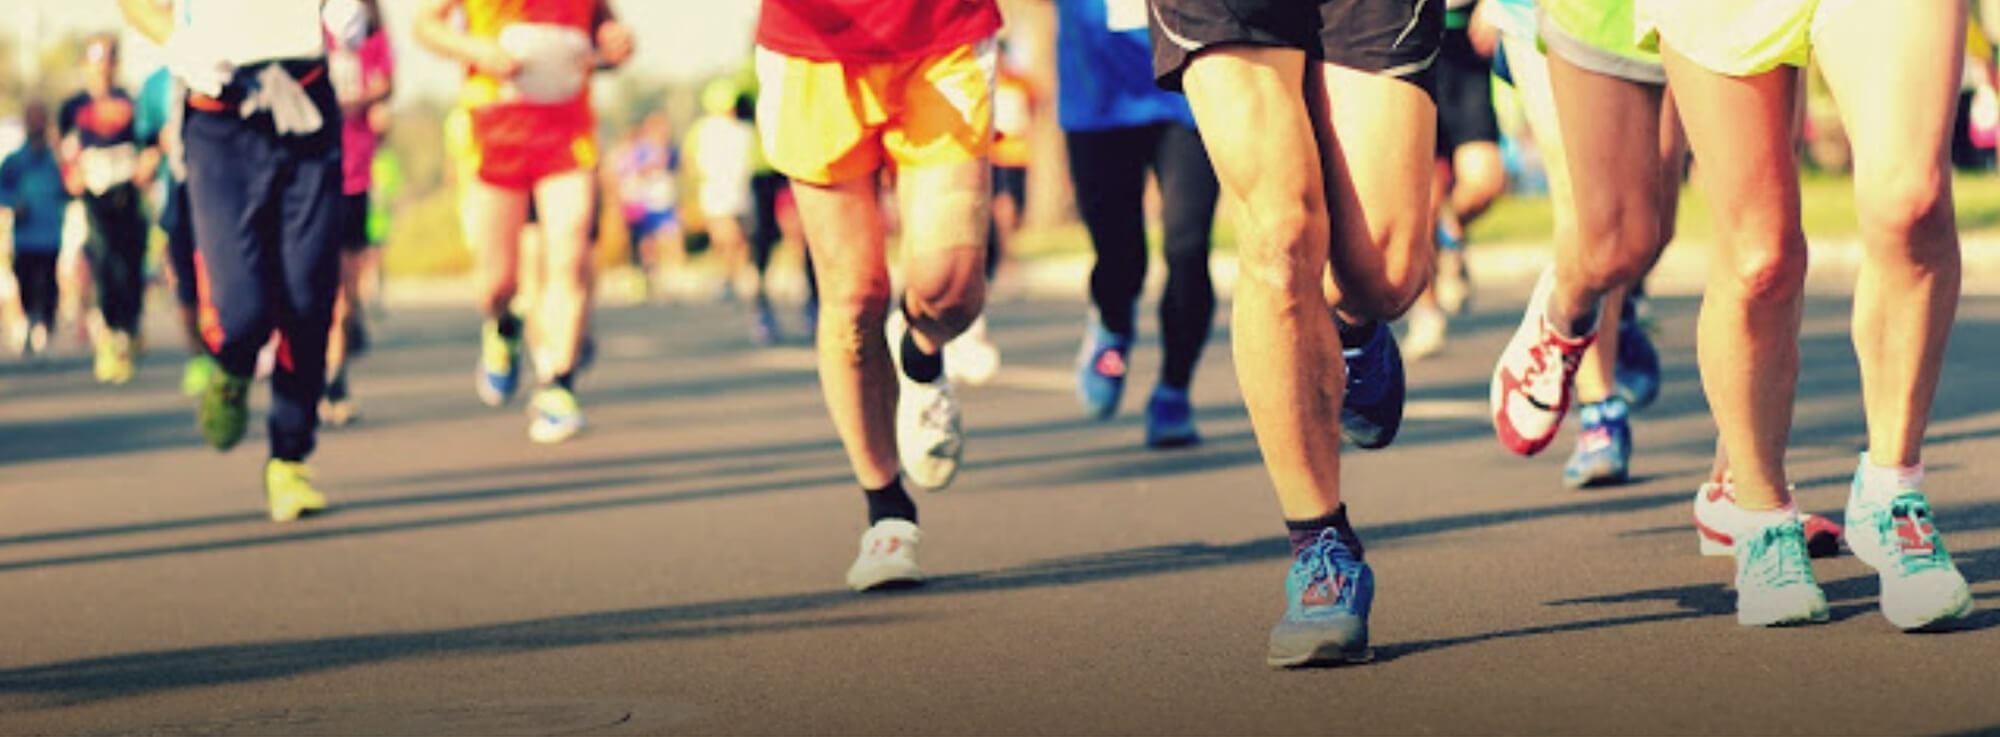 Poggio Imperiale: Poggio Imperiale Lesina Half Marathon